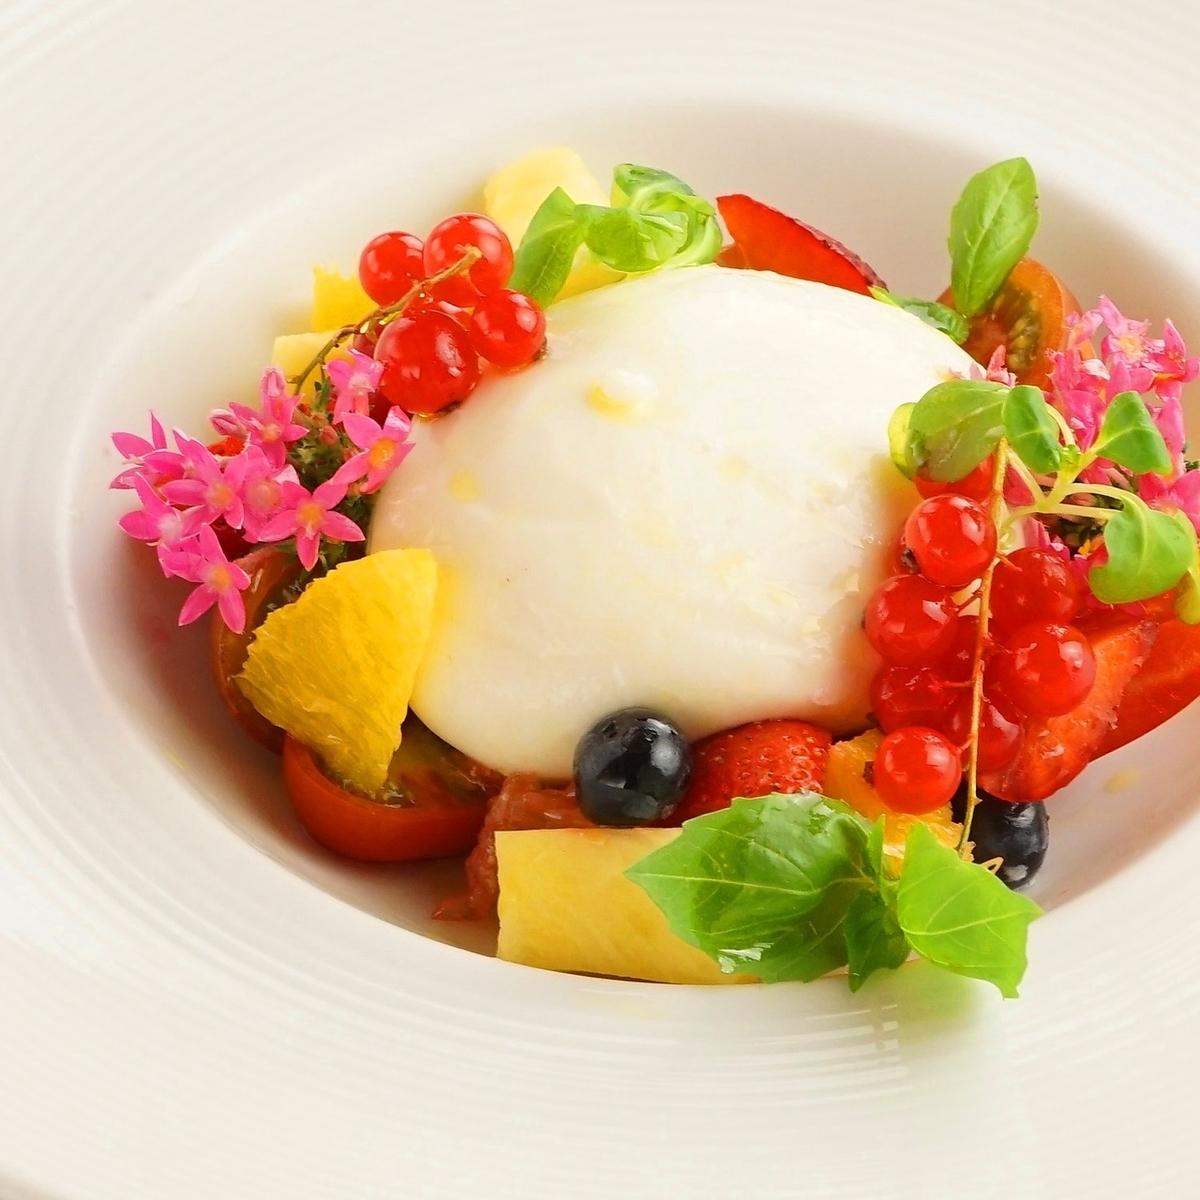 【Quantity Limited】 Fresh Burrata cheese and tomato, seasonal fruit Caprese